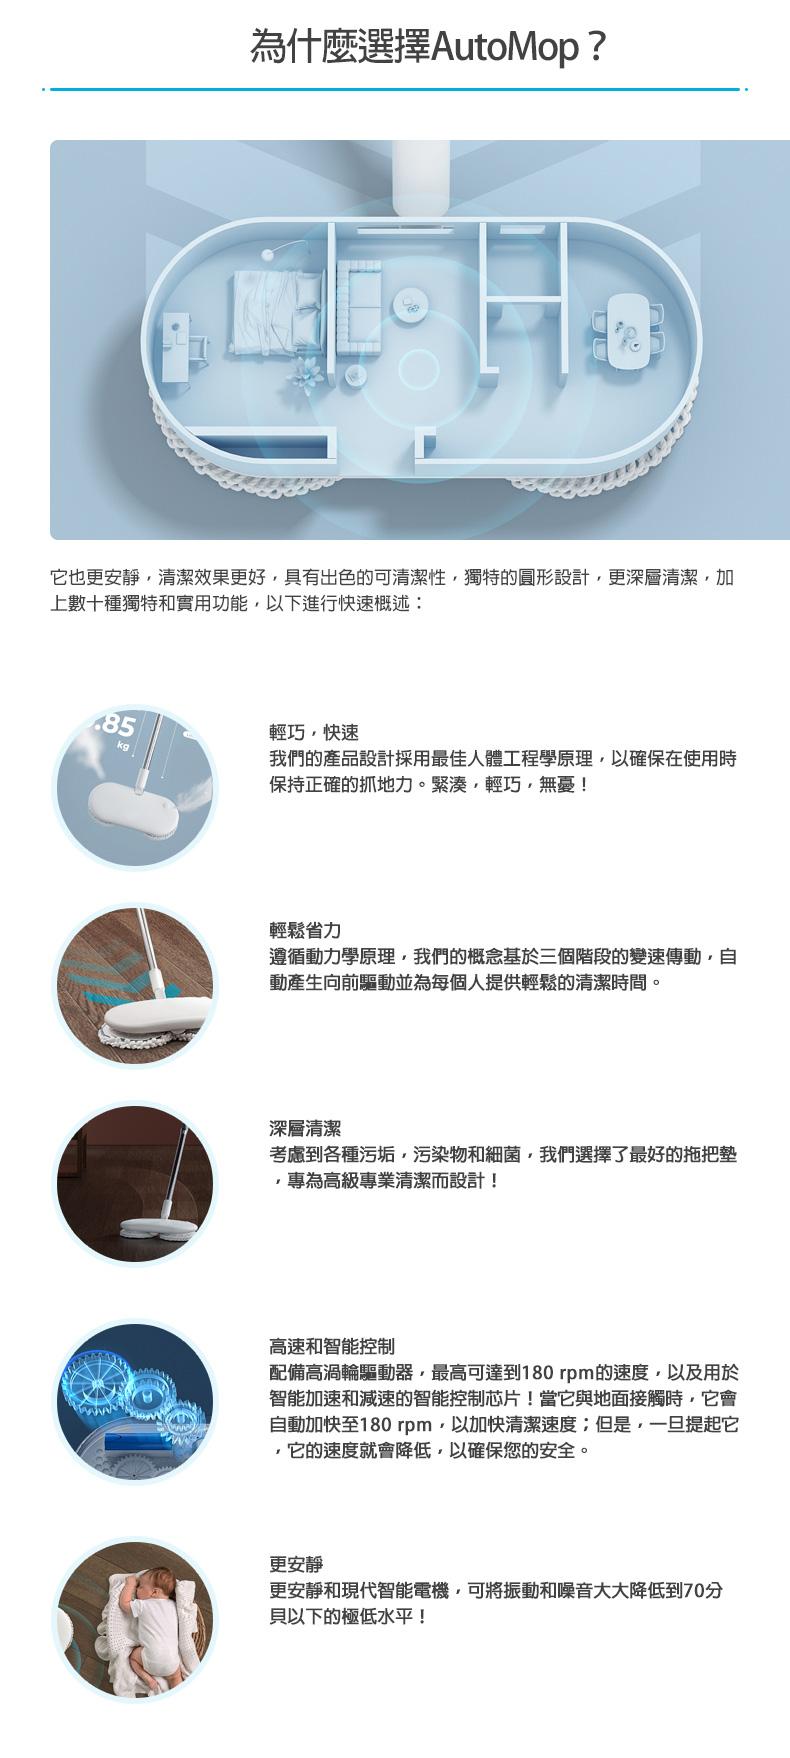 Amoovars-Automop-5cm-纖薄機身-智能手持無線電動擦地清潔機